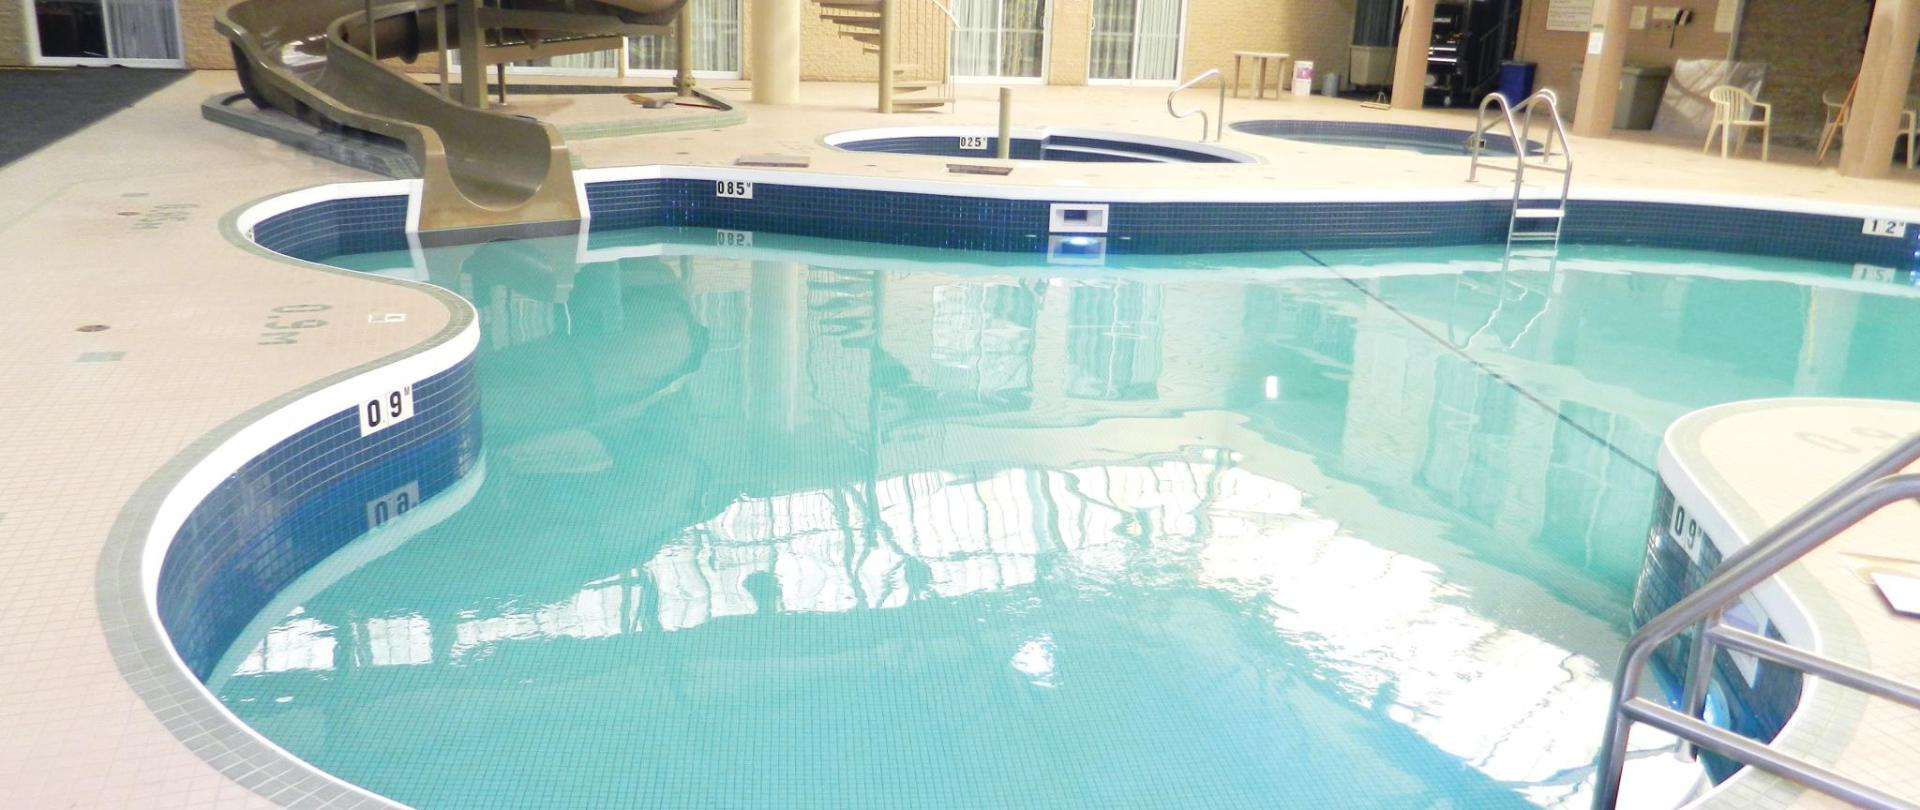 Renovated Pool 2018.jpg